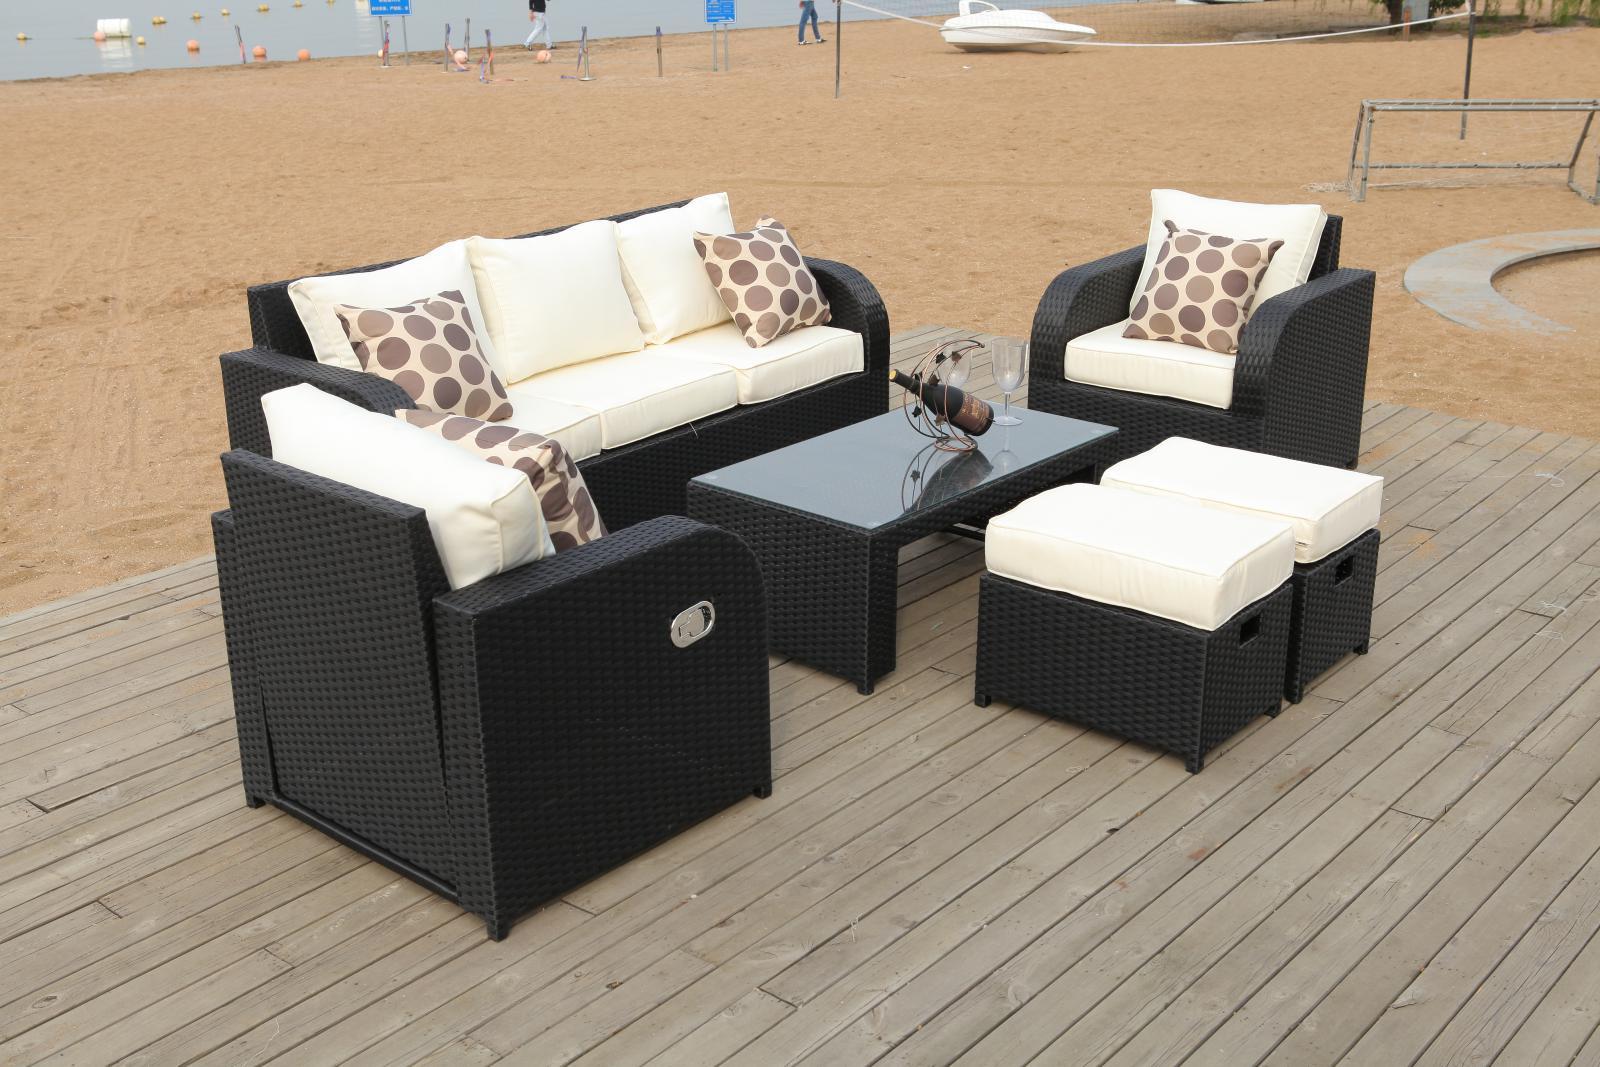 Lotus Rattan Garden Furniture Set Sofa Reclining Chairs Conservatory Outdoor Ebay